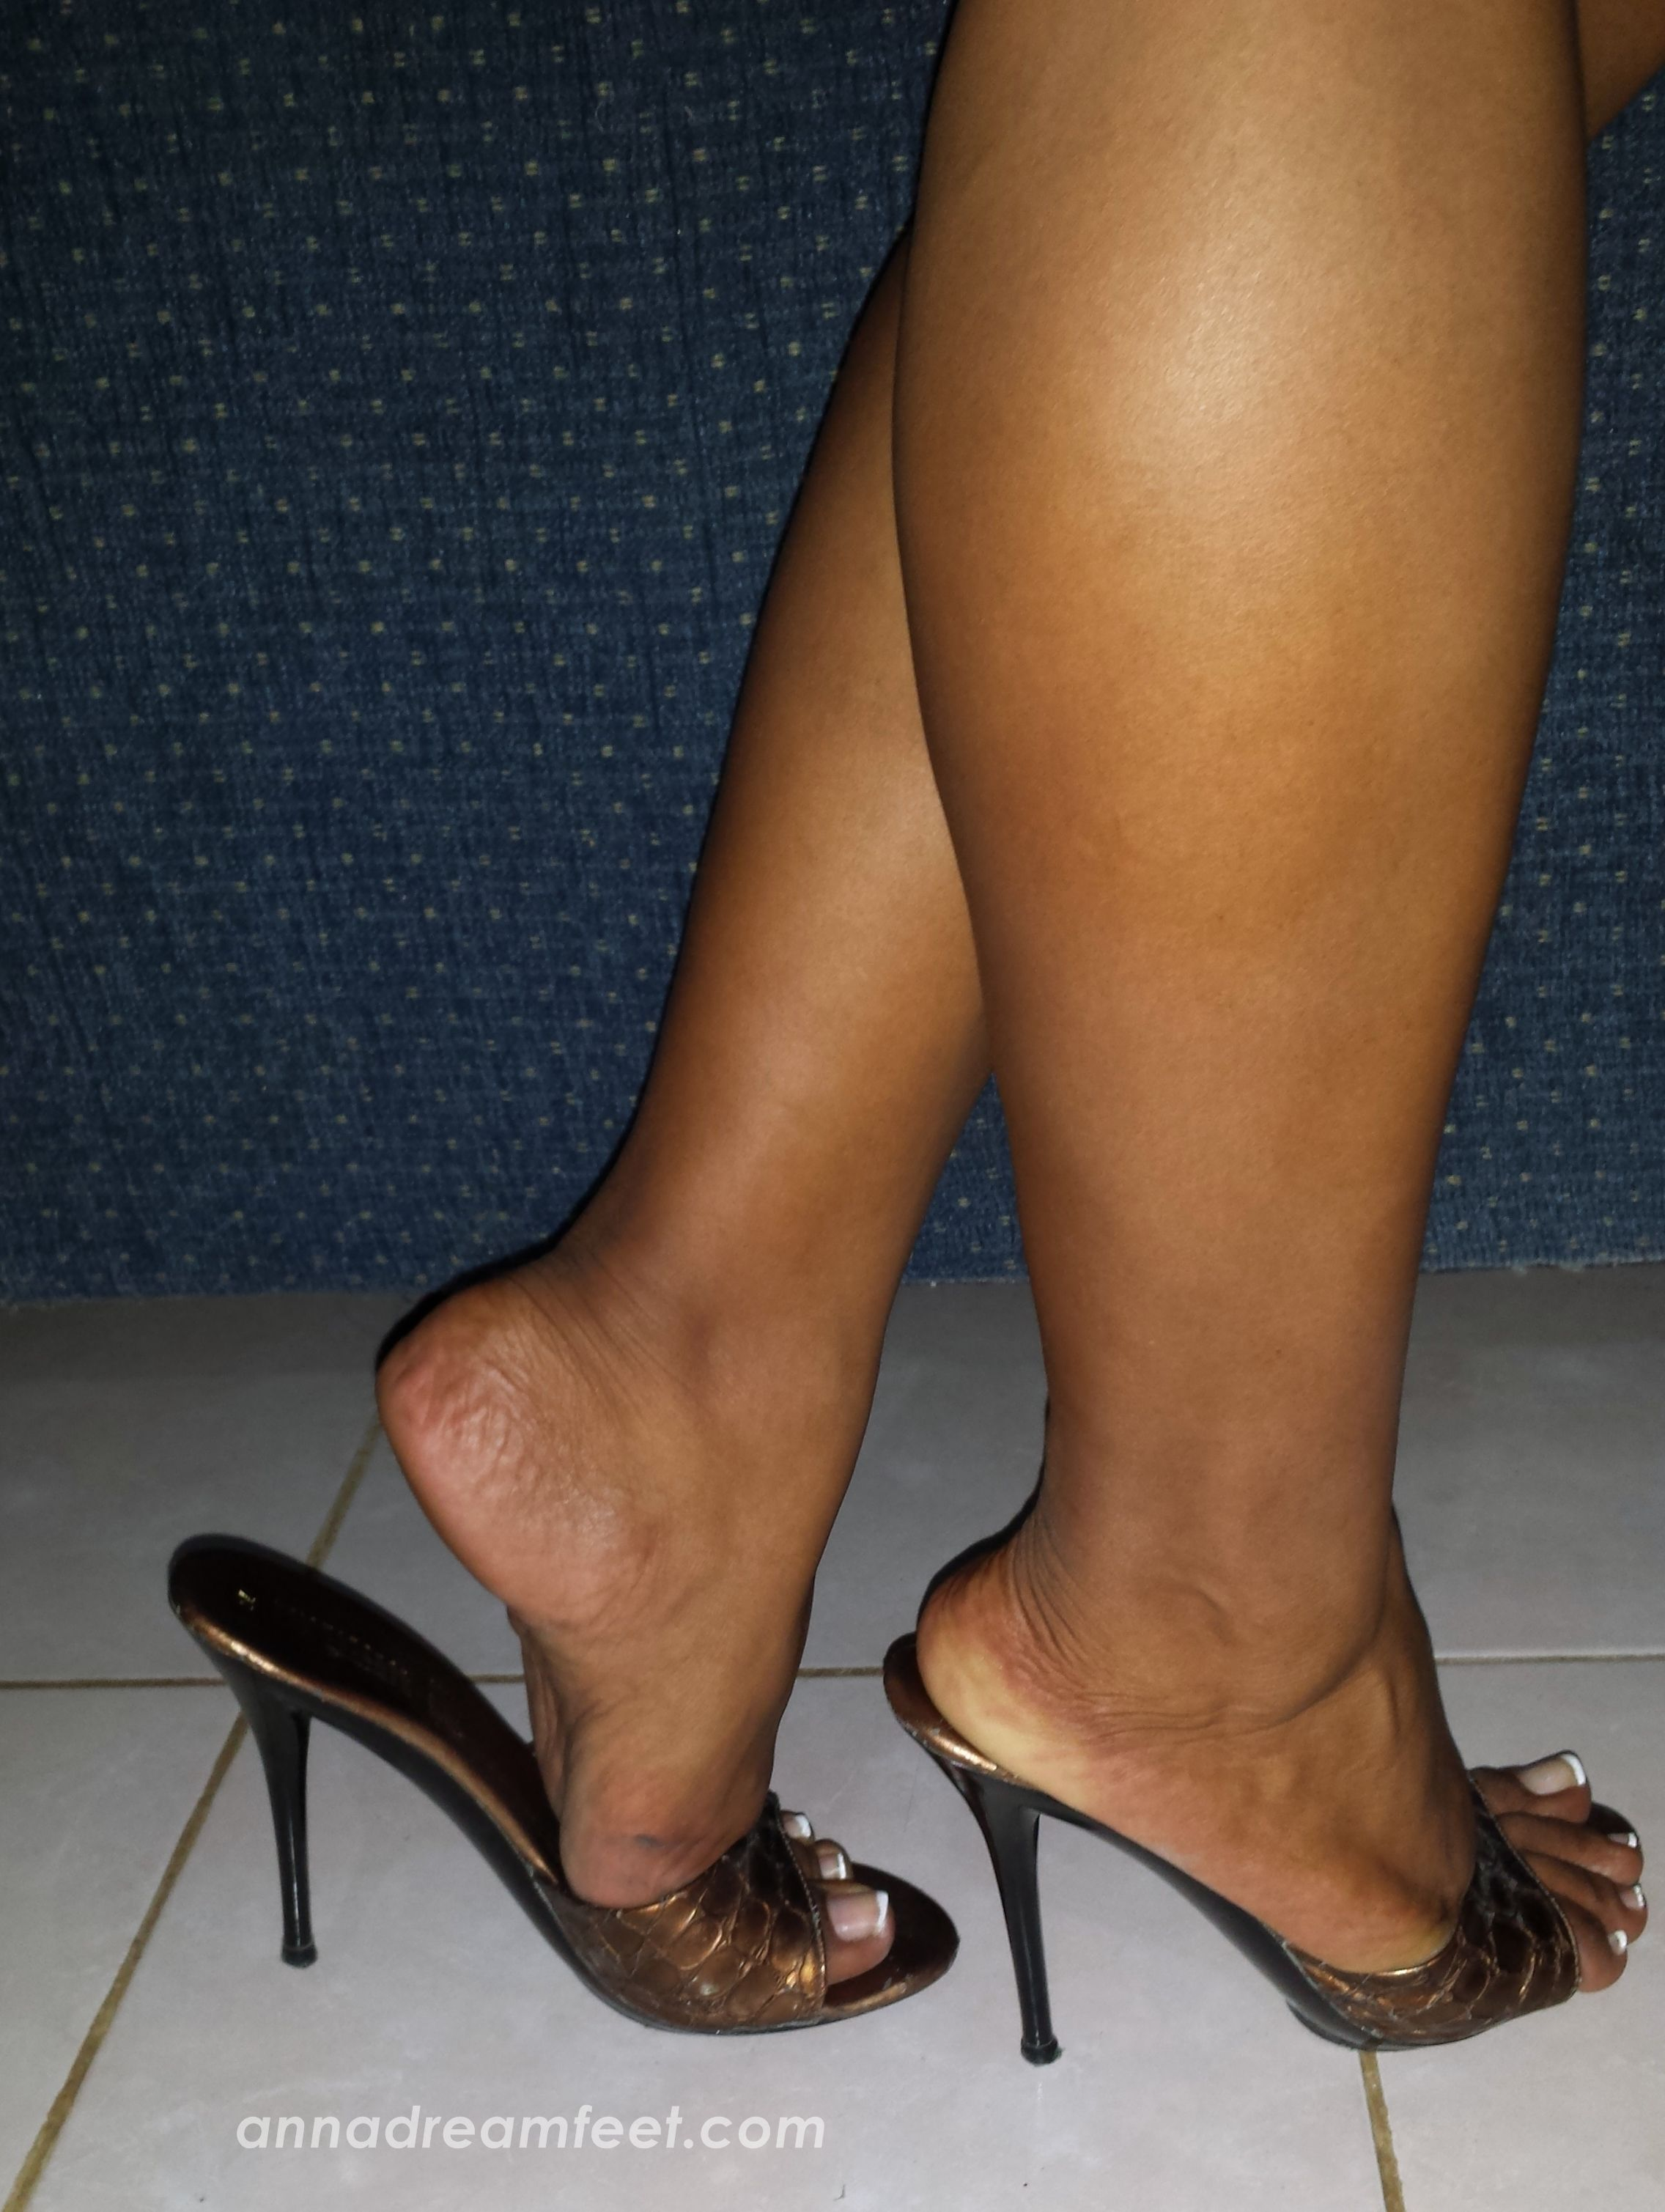 Kourtney kardashian's sexy feet and nude legs in hot high heels